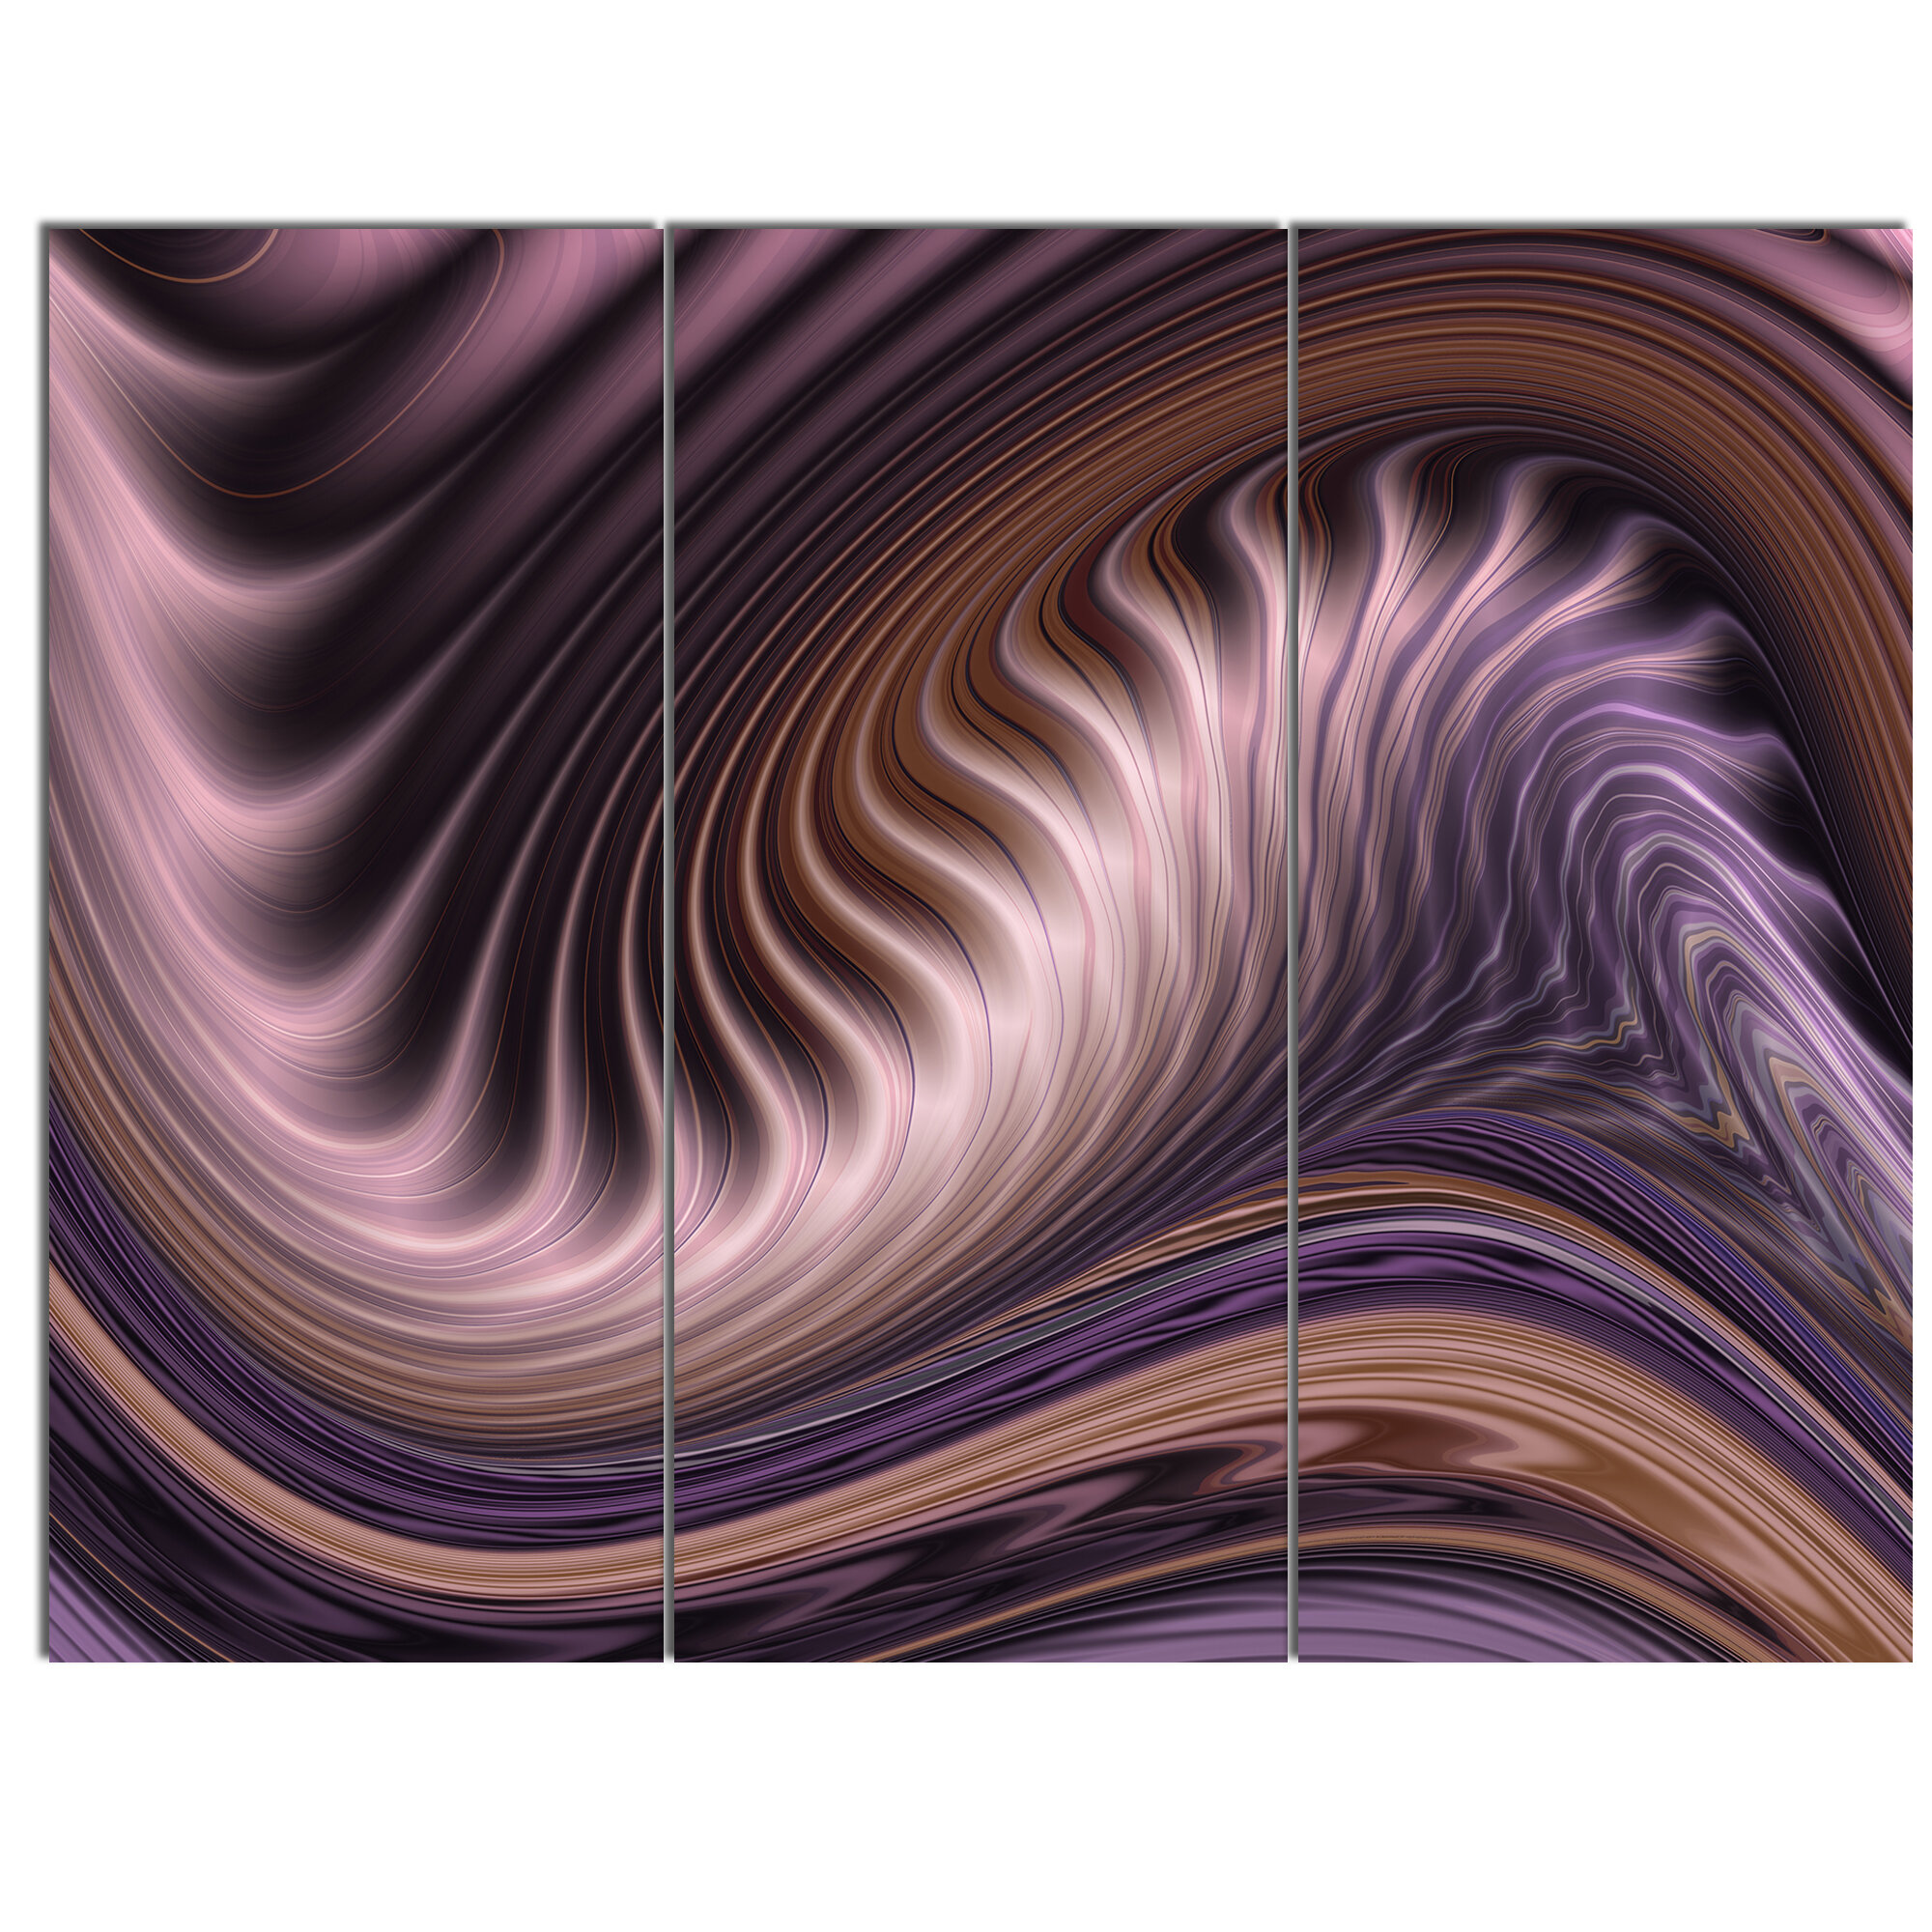 5da5a2da623 DesignArt  Purple Waves Fractal Wall Art  3 Piece Graphic Art on Wrapped  Canvas Set